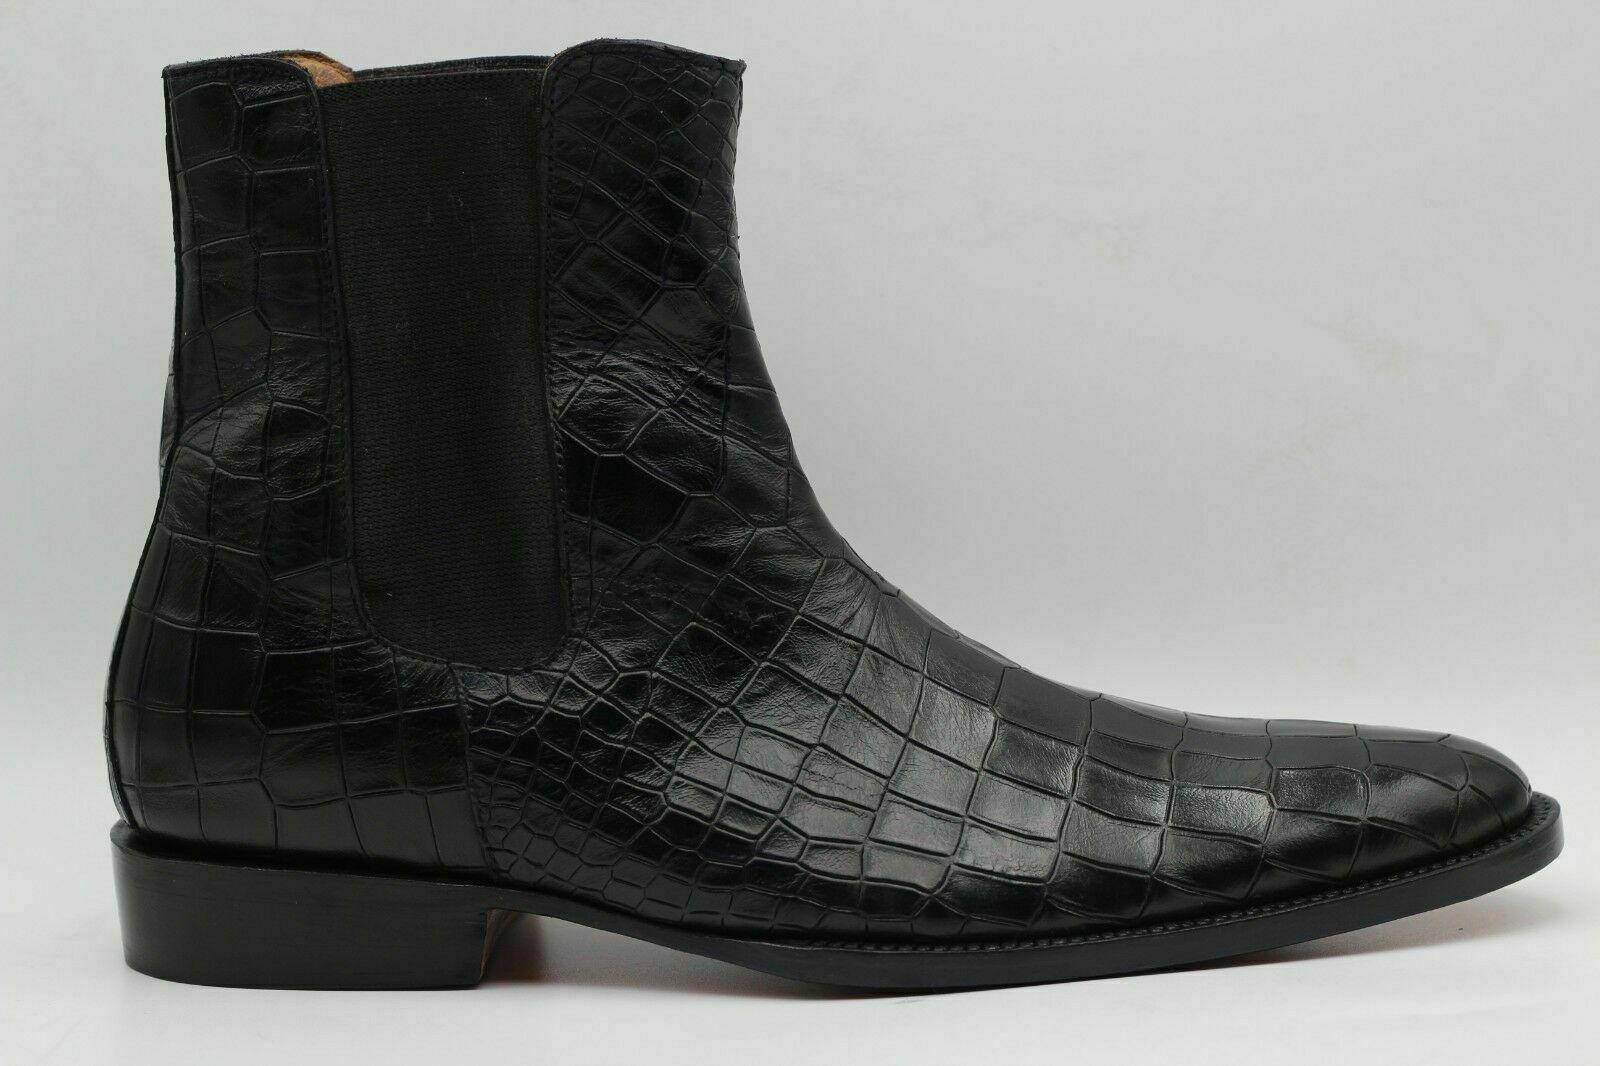 neroe handgefertigte neroe Chelsea-Lederstivali mit Krokodil-Print